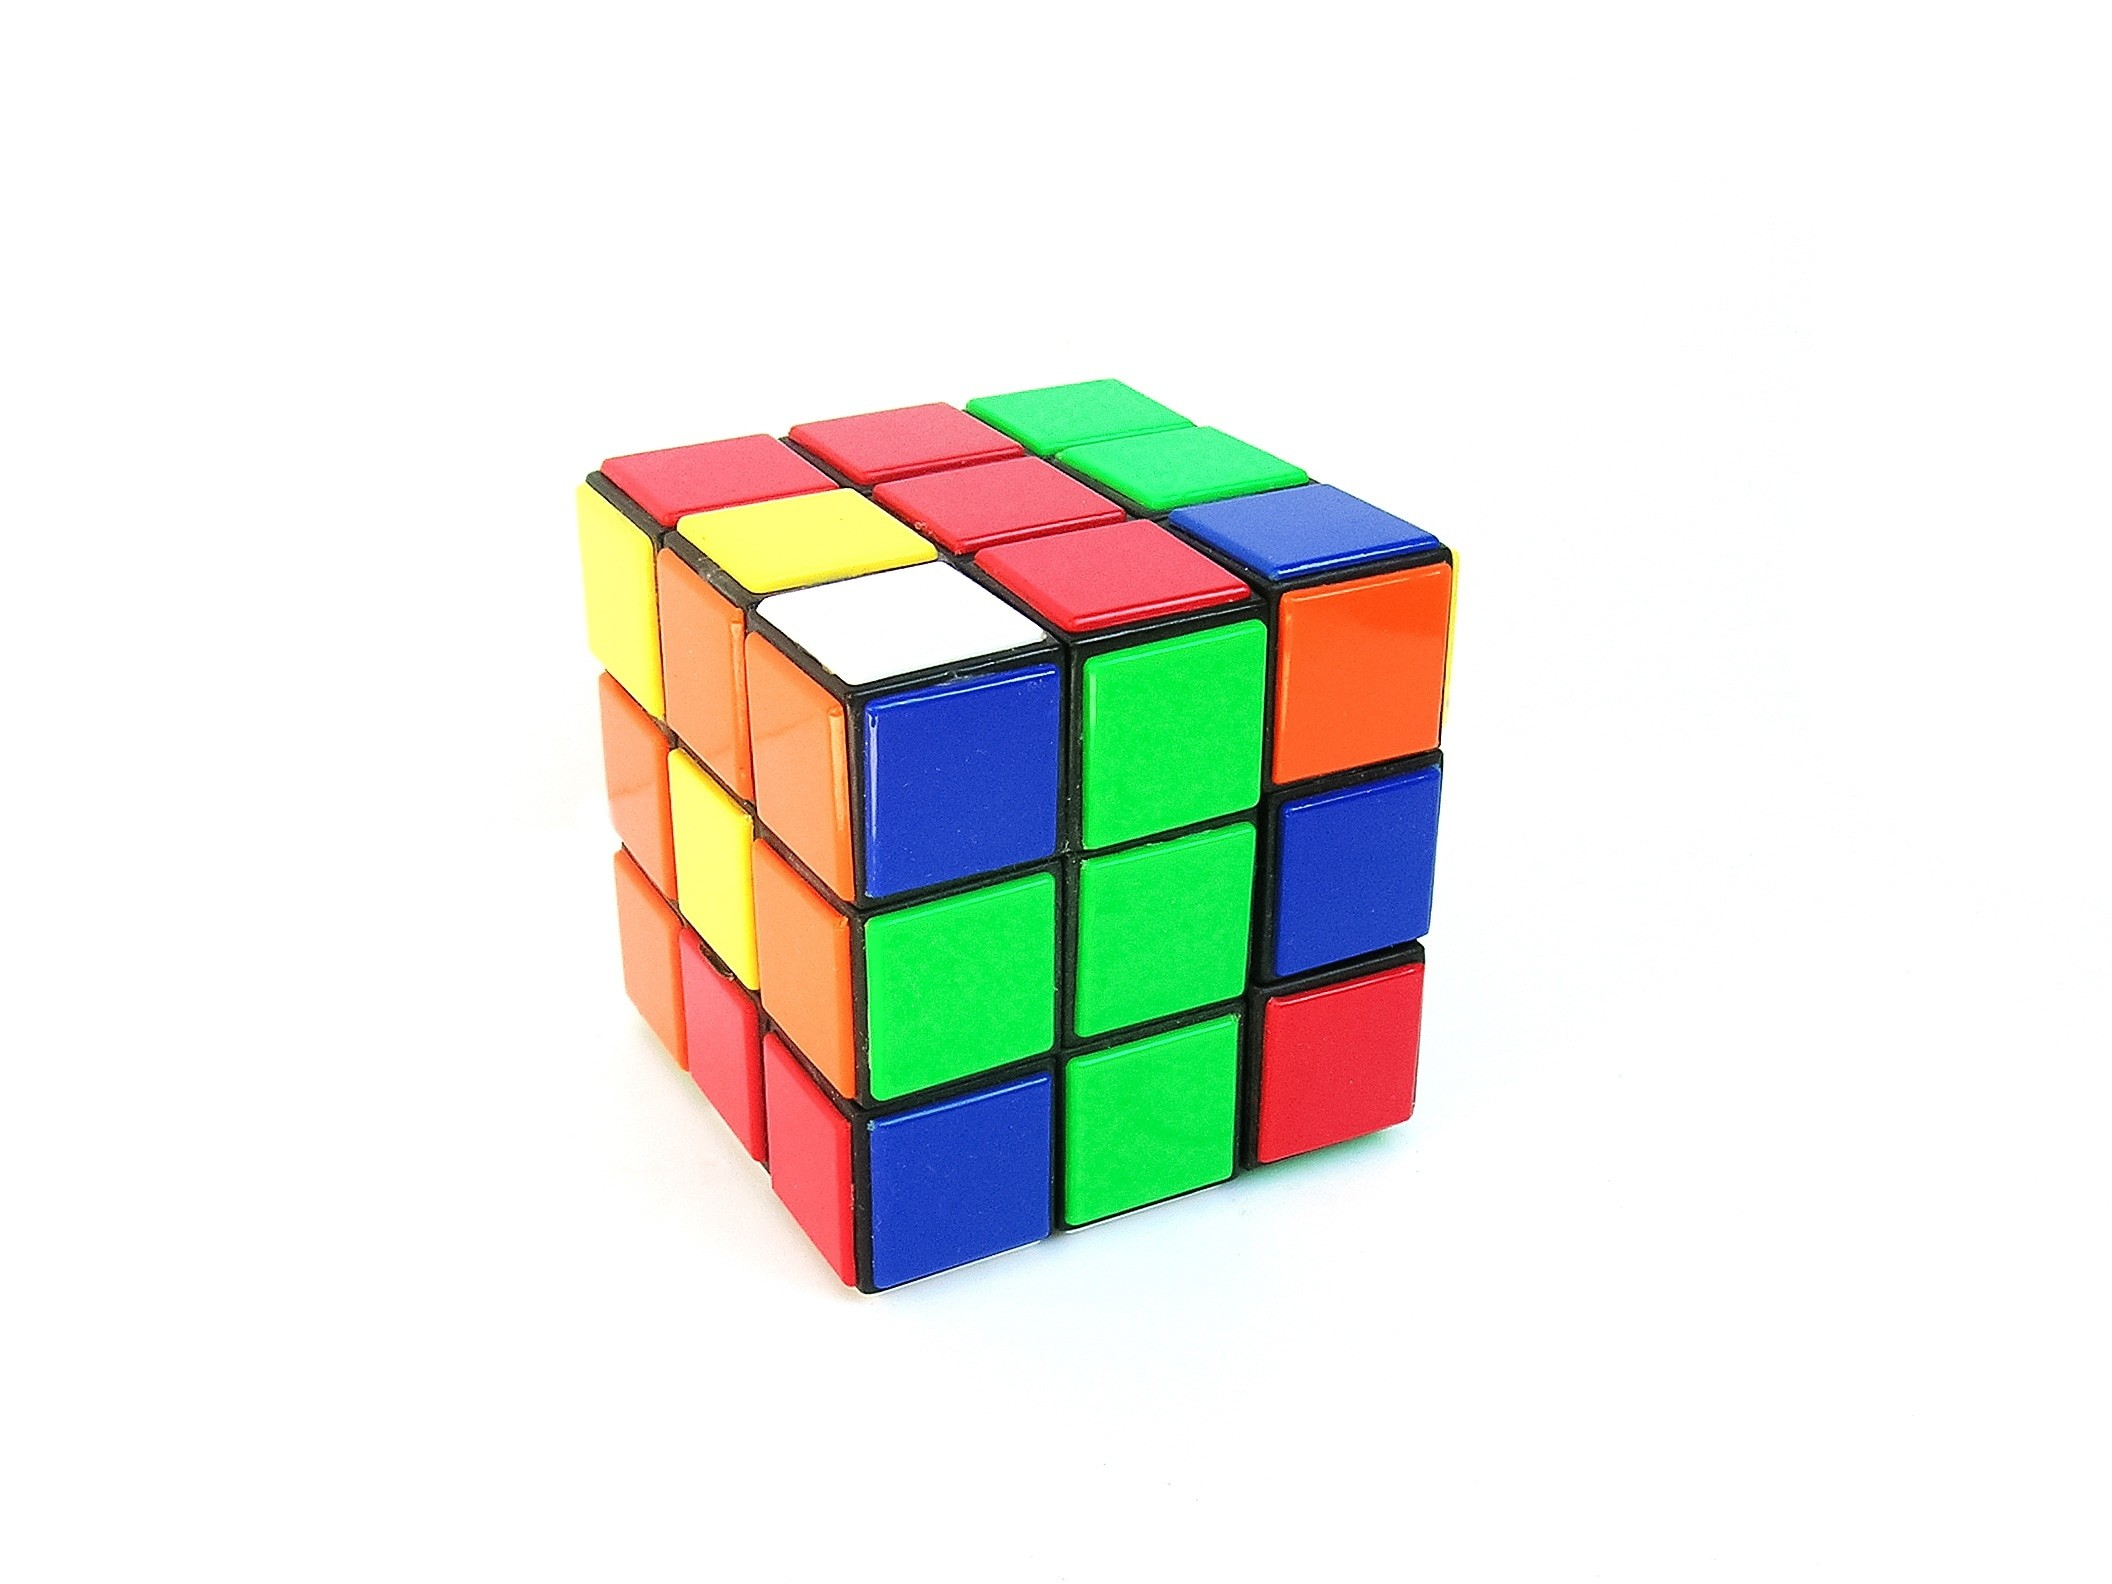 3×3 rubiks cube